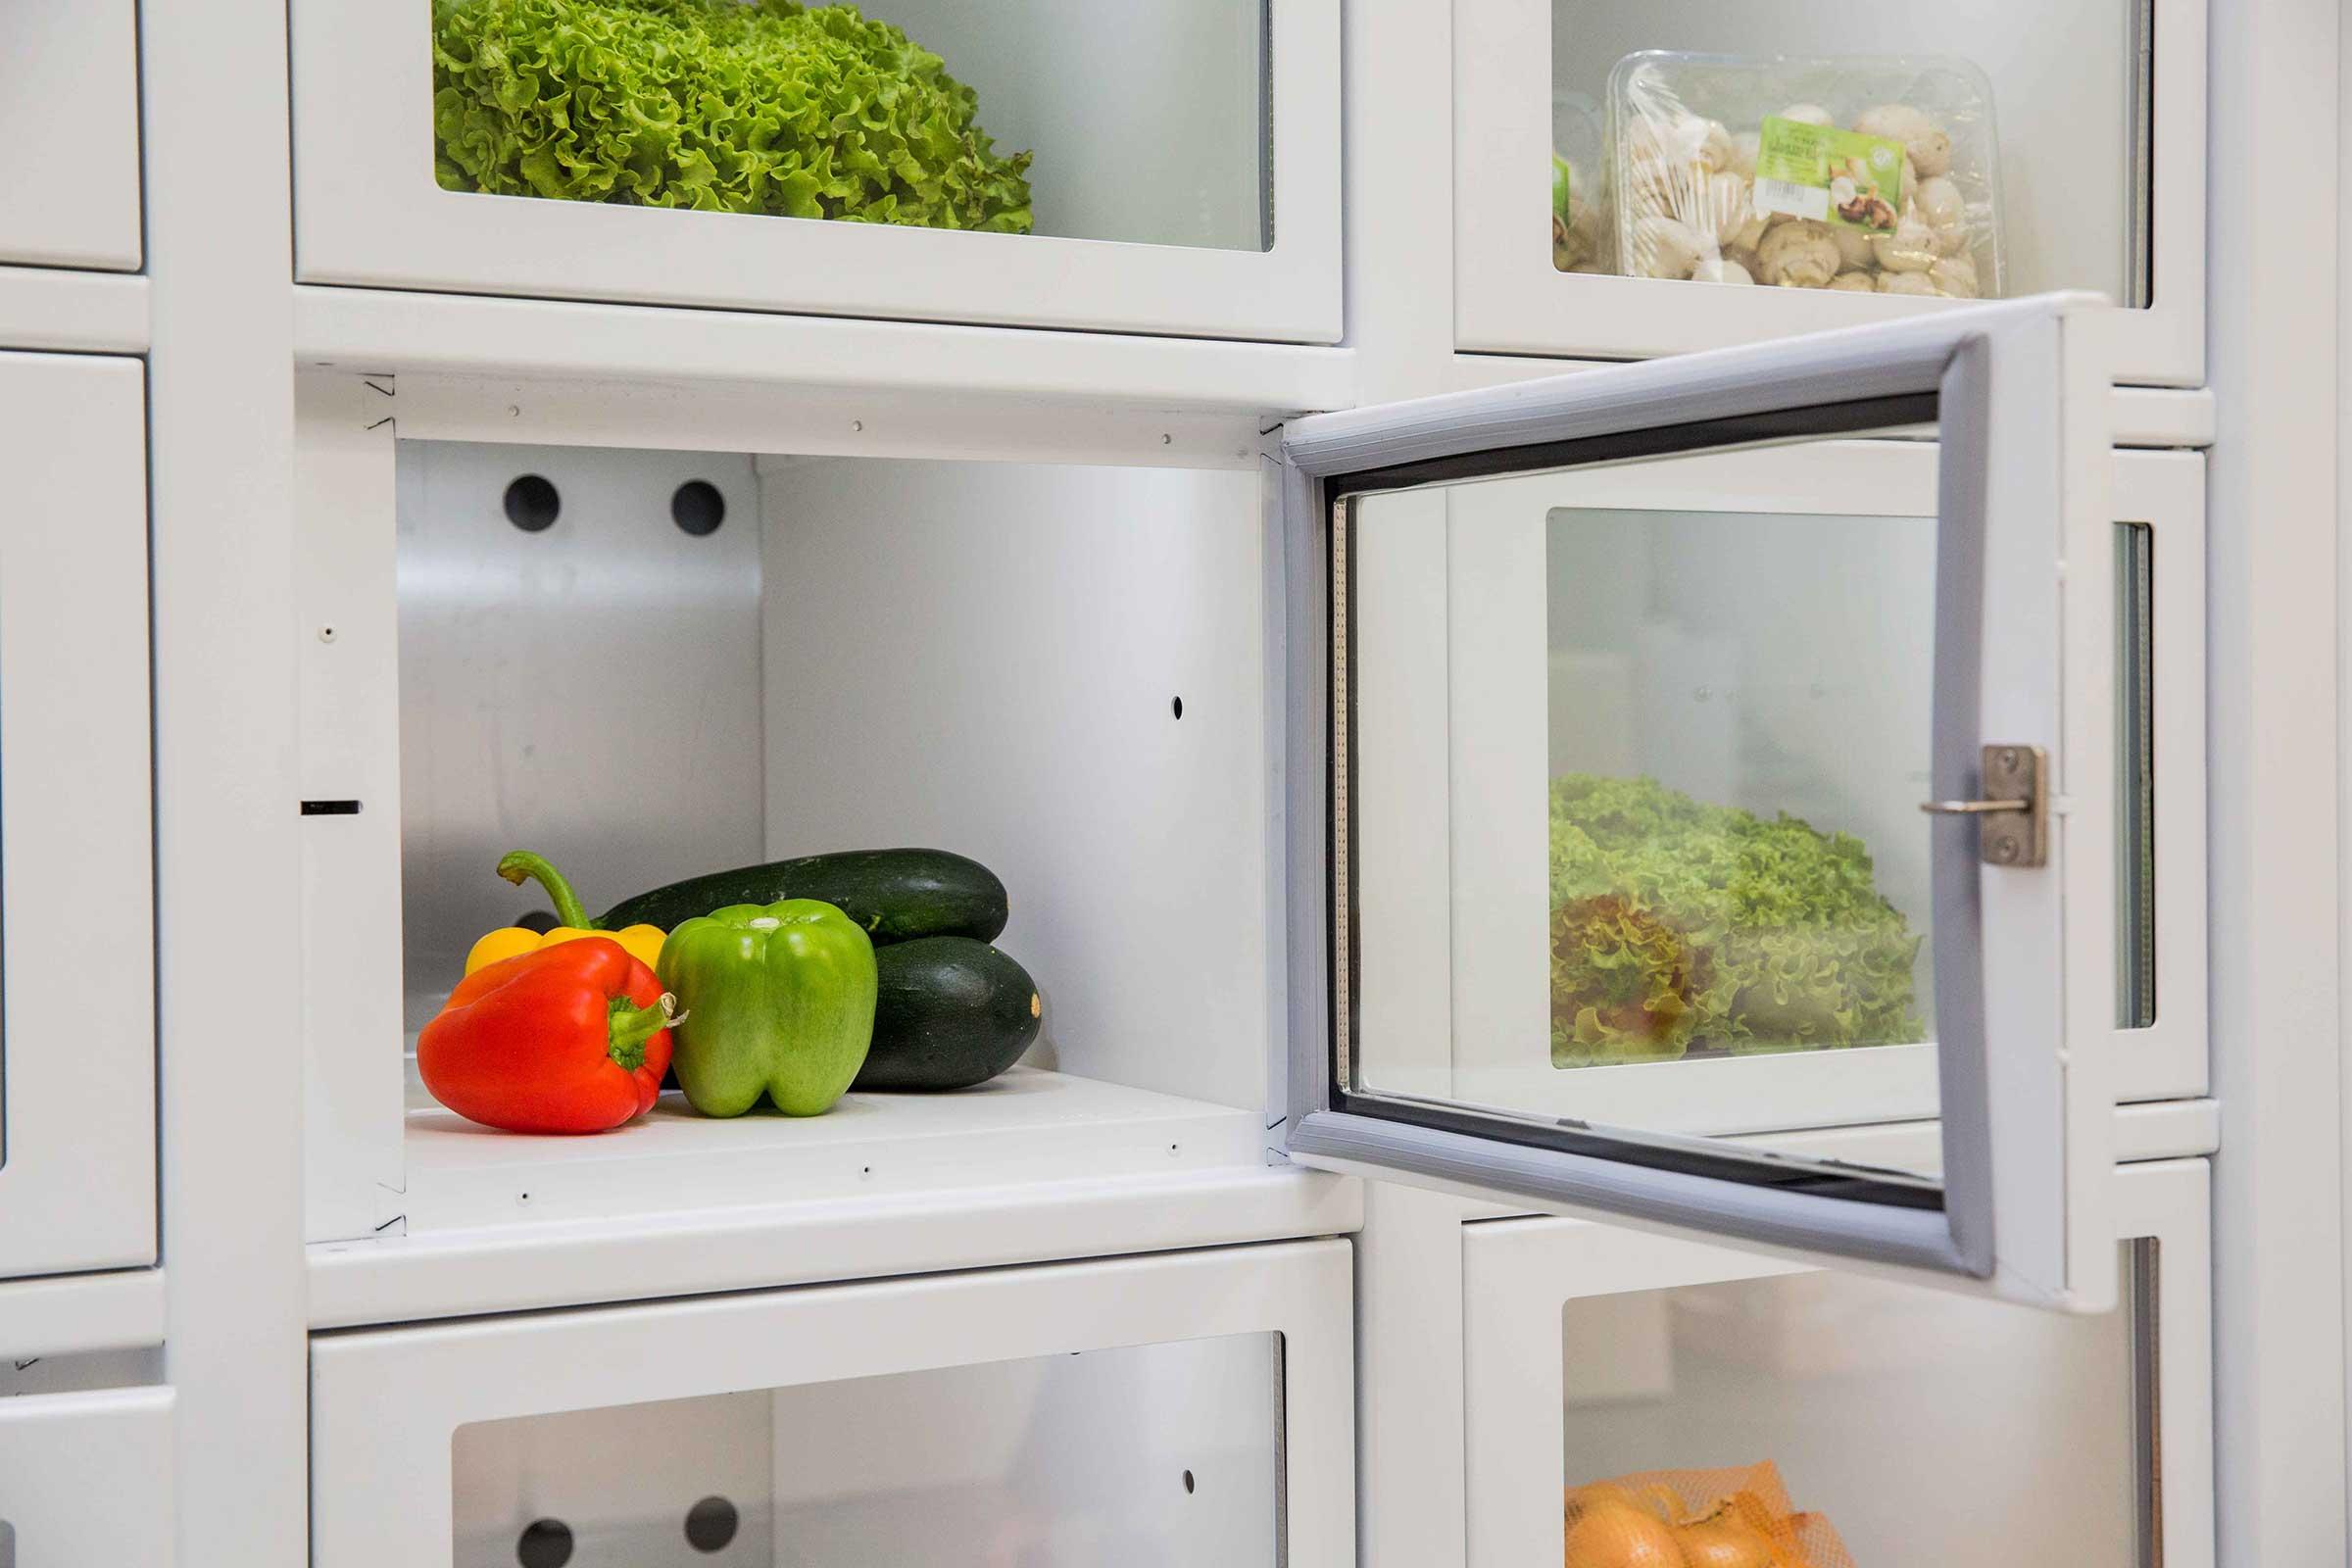 Verduras en una máquina expendedora Le Casier Français